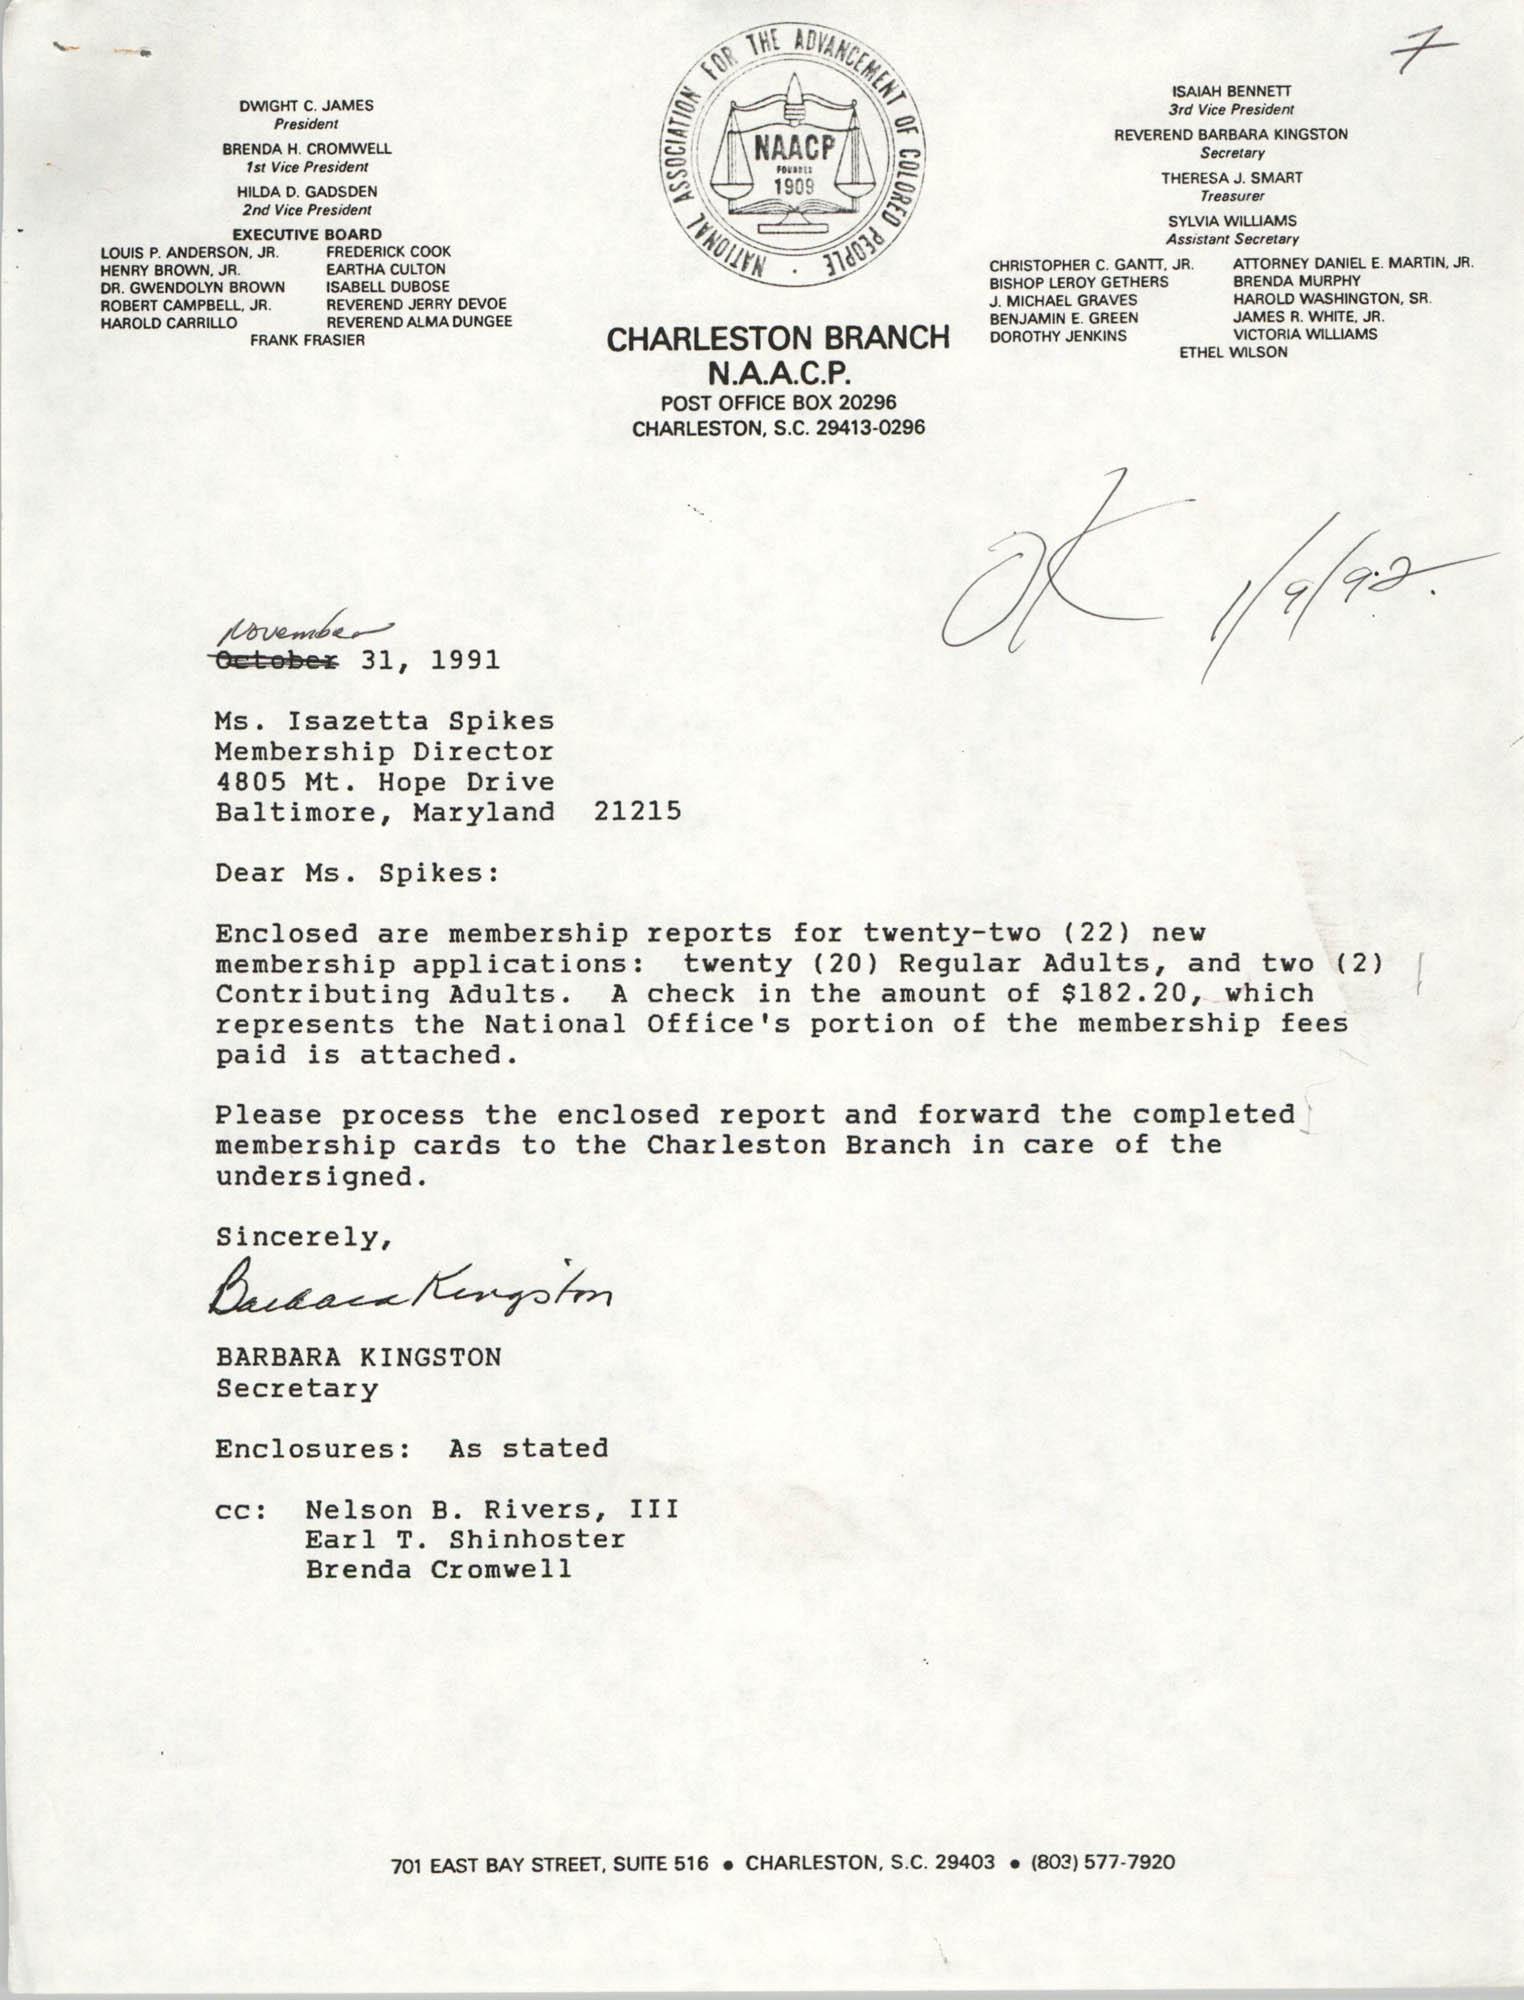 Letter from Barbara Kingston to Isazetta Spikes, November 31, 1991